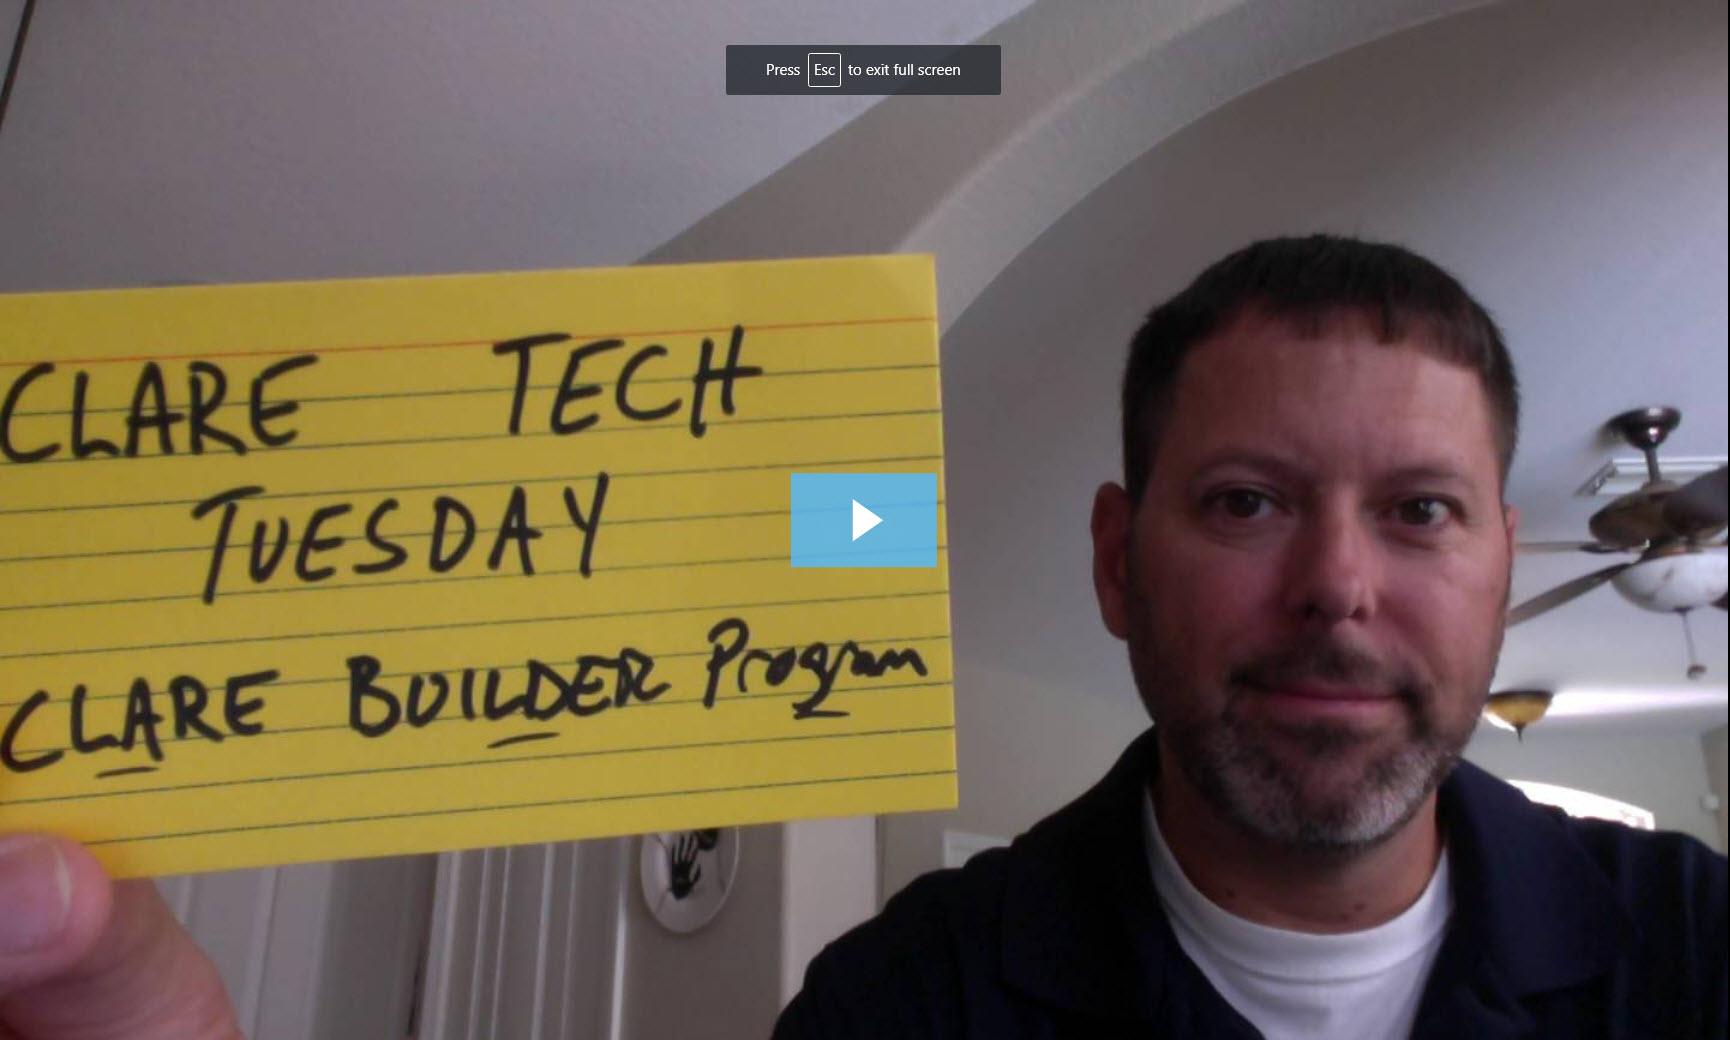 Dealer News - Clare Builder Program